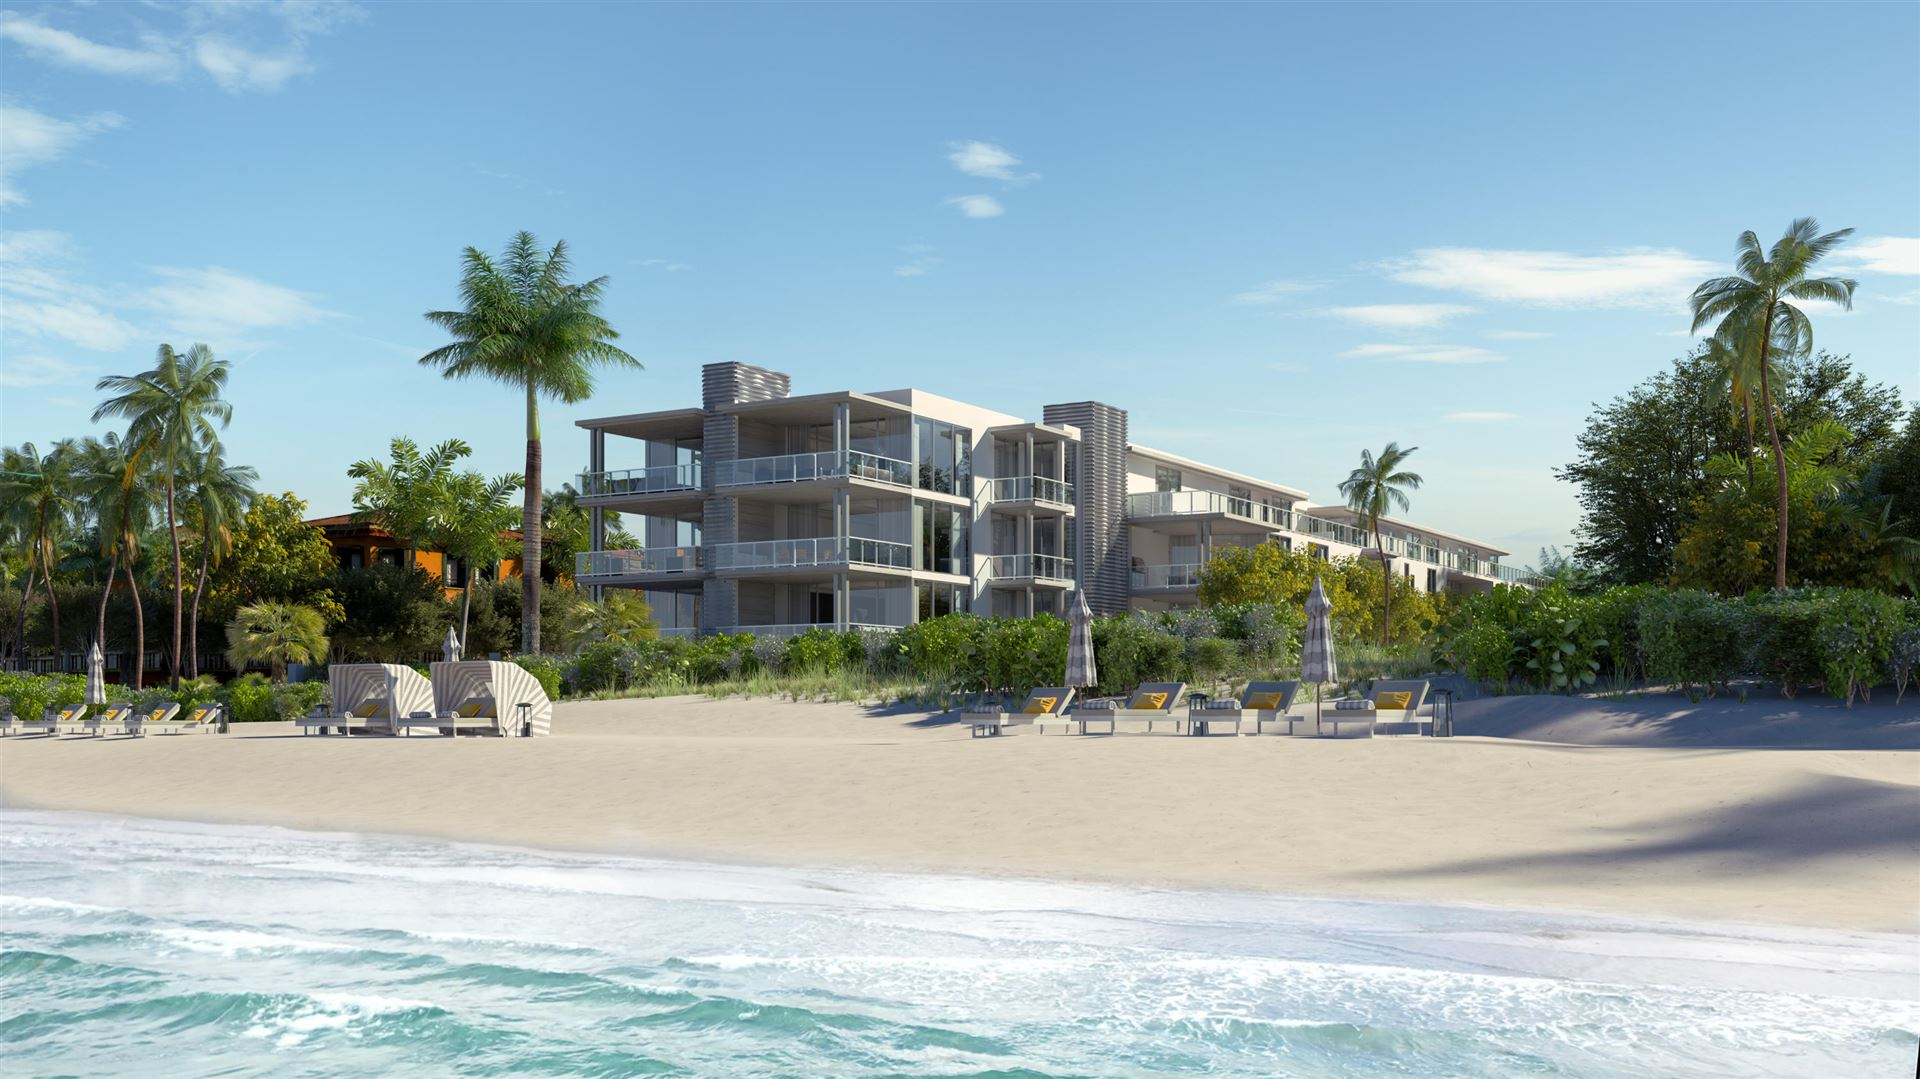 1625 South Ocean Properties For Sale